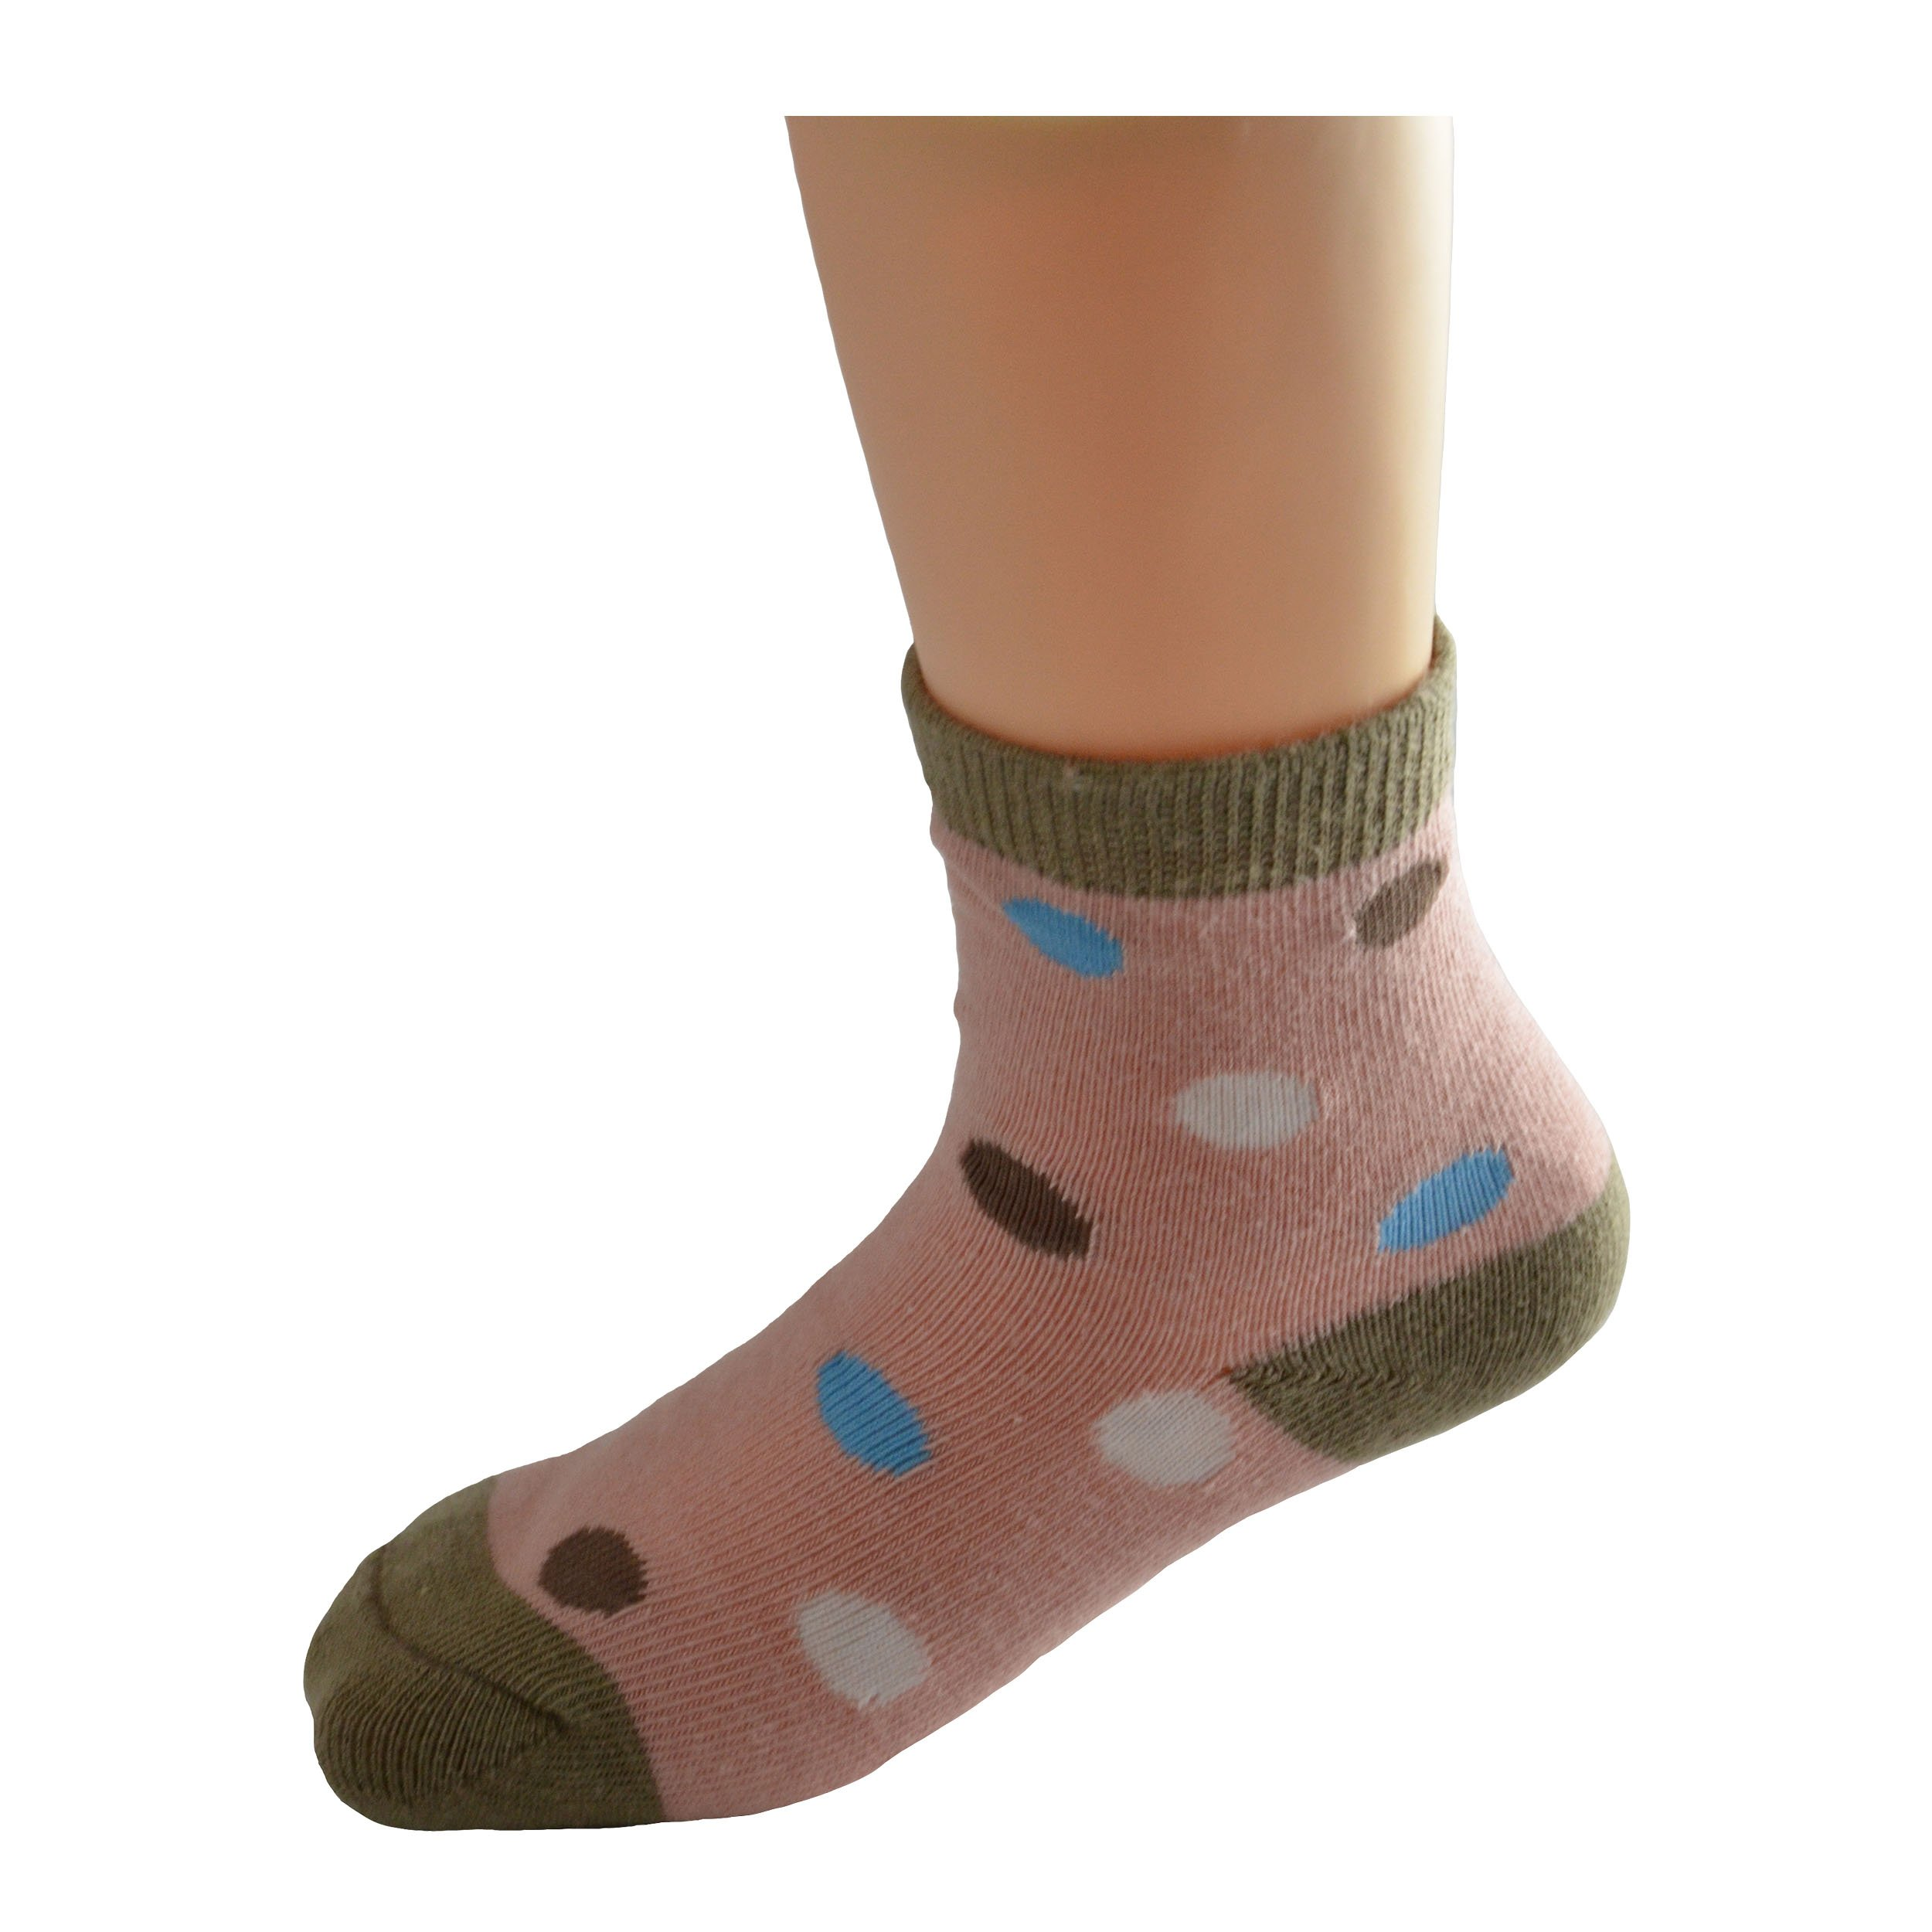 Lomon Girls Polka Dots and Stripes Crew Socks 5 Pairs